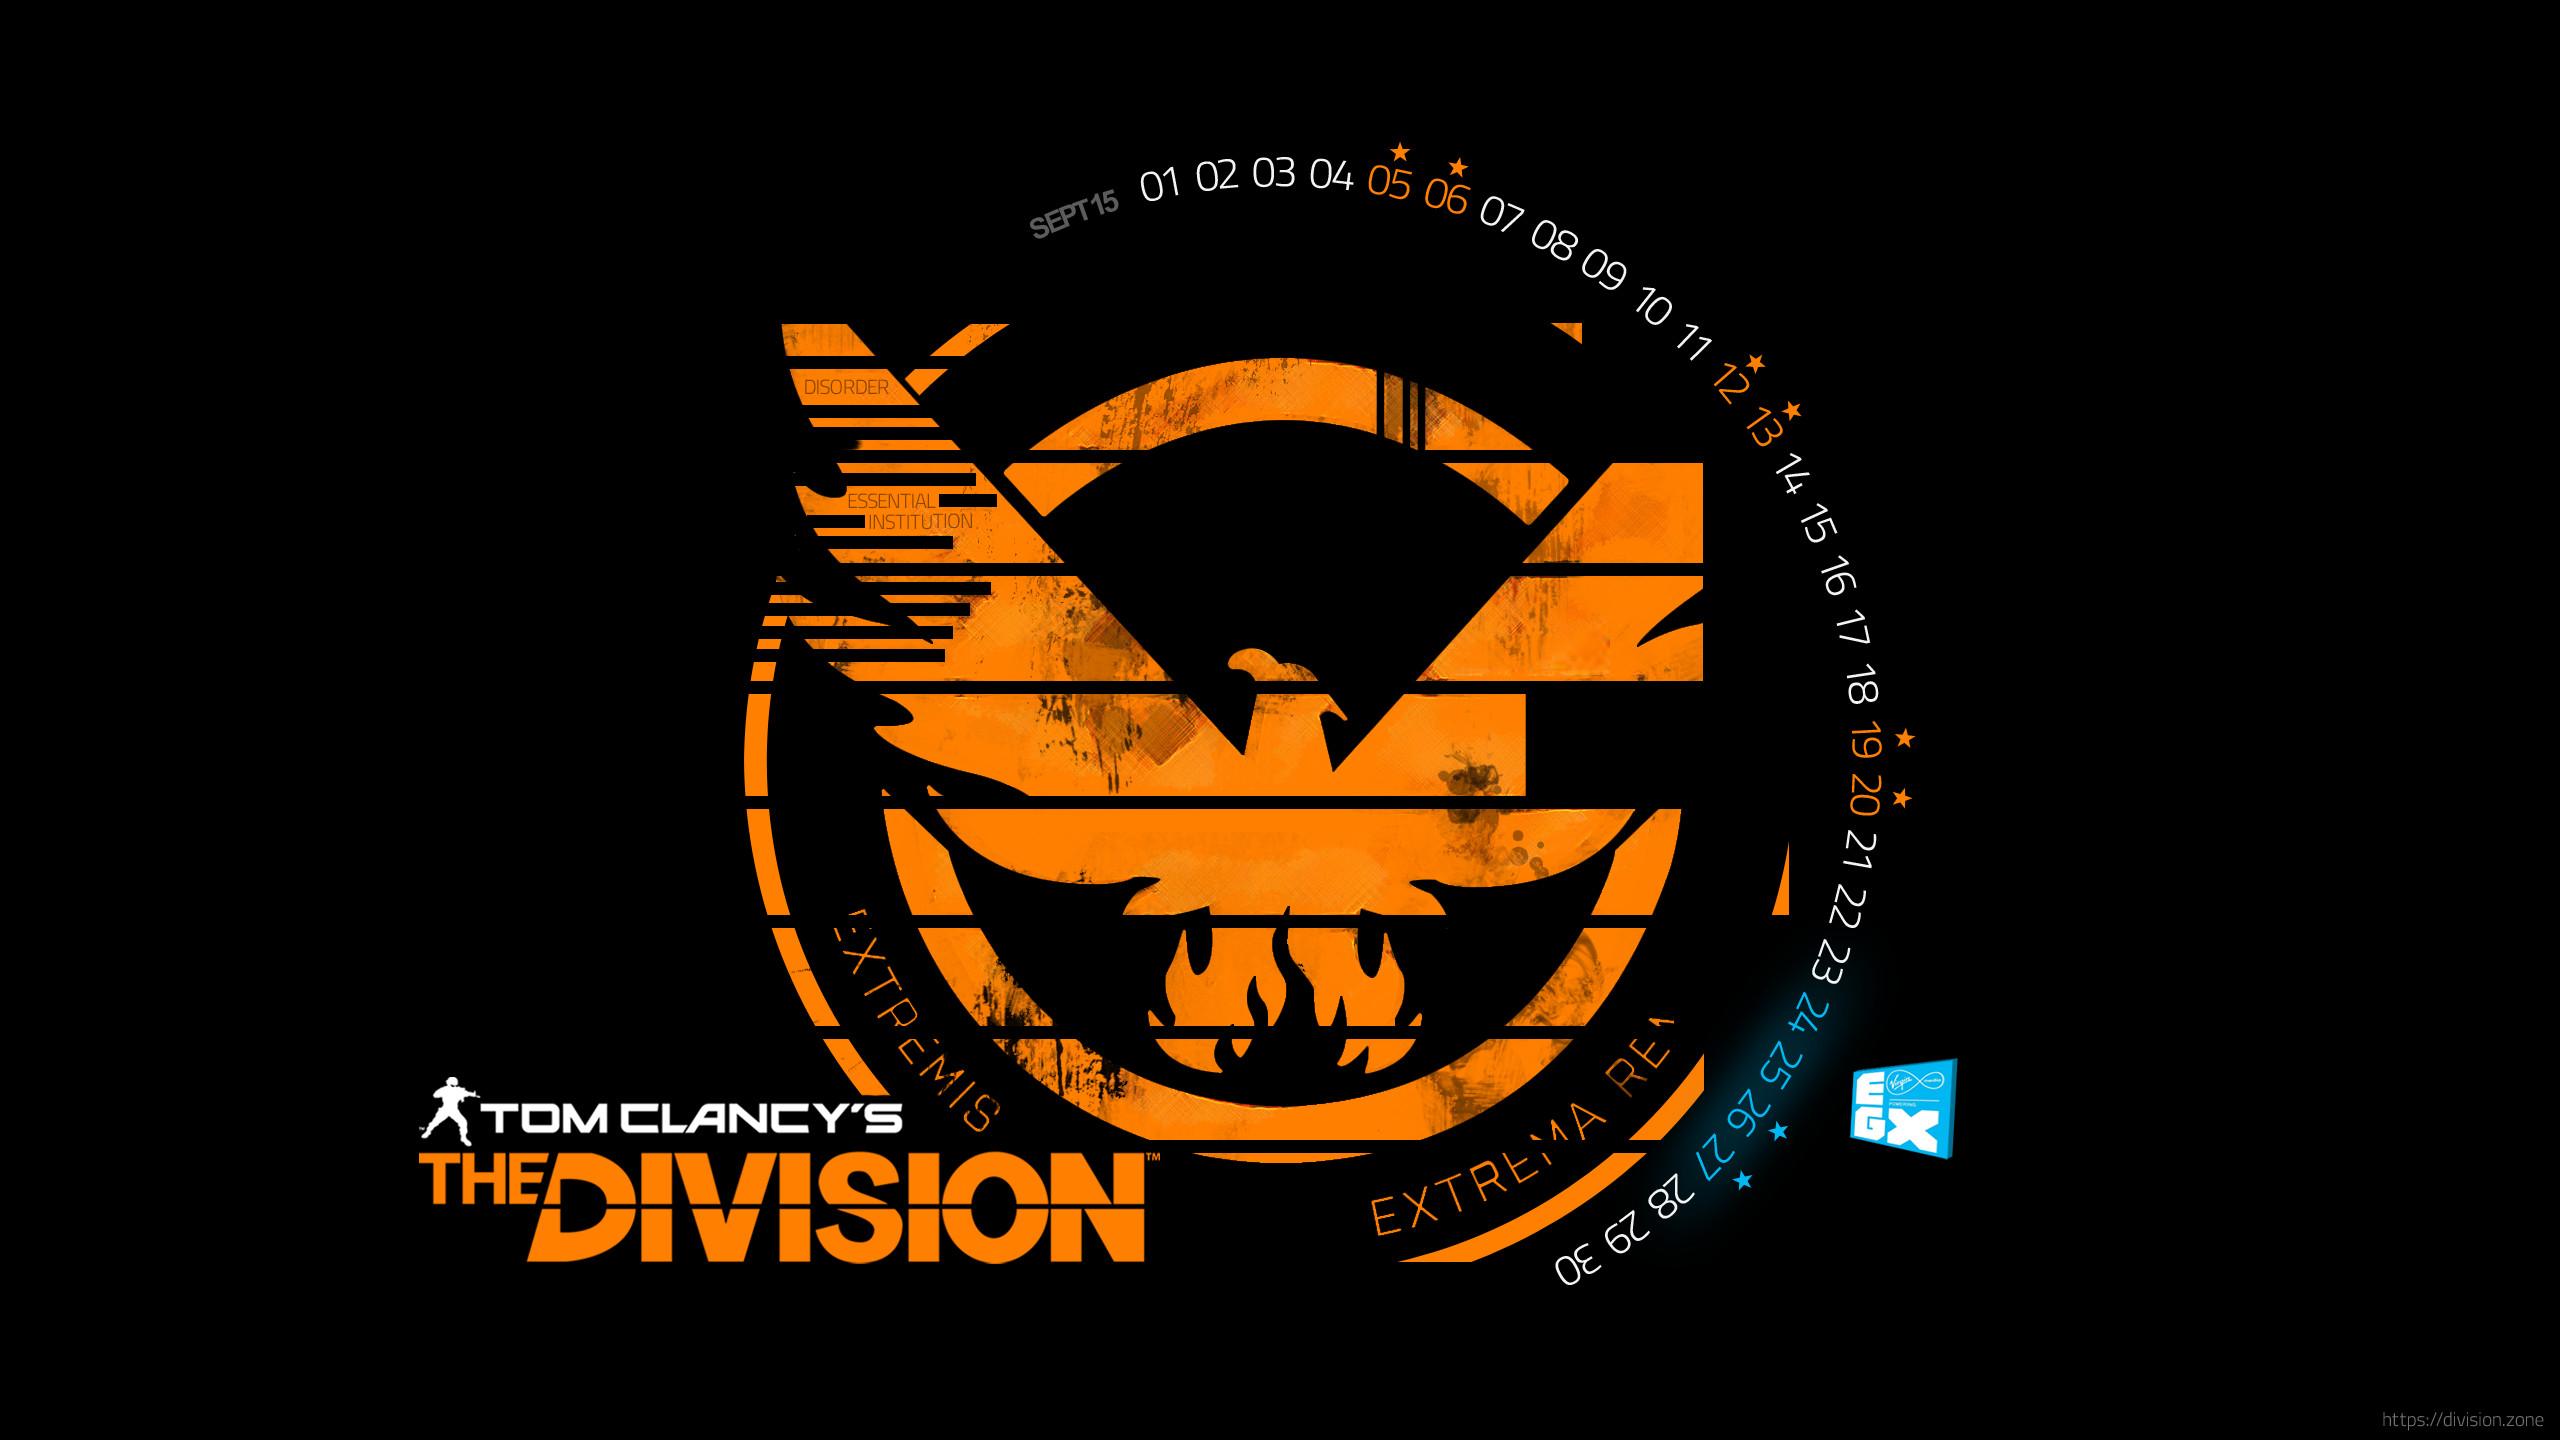 the-division-calendar-09-15-wallpaper-2560×1440.png